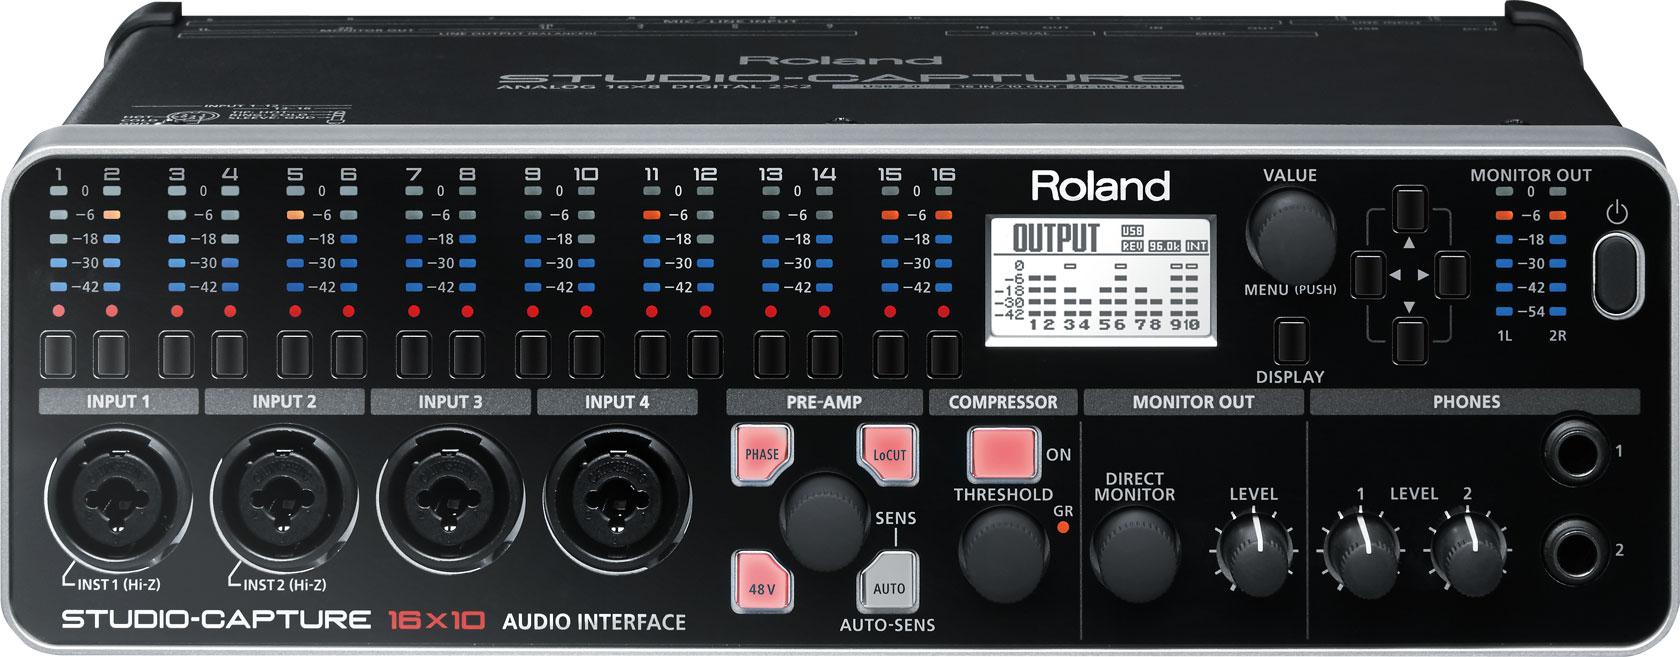 roland ua 1610 studio capture usb audio interface metro sound and music. Black Bedroom Furniture Sets. Home Design Ideas